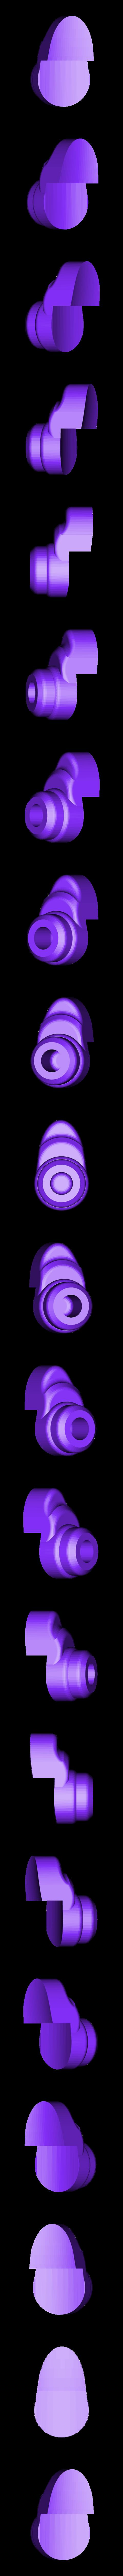 GB-Upper-Box01.stl Download free STL file Jet Engine, 3-Spool • 3D printable object, konchan77